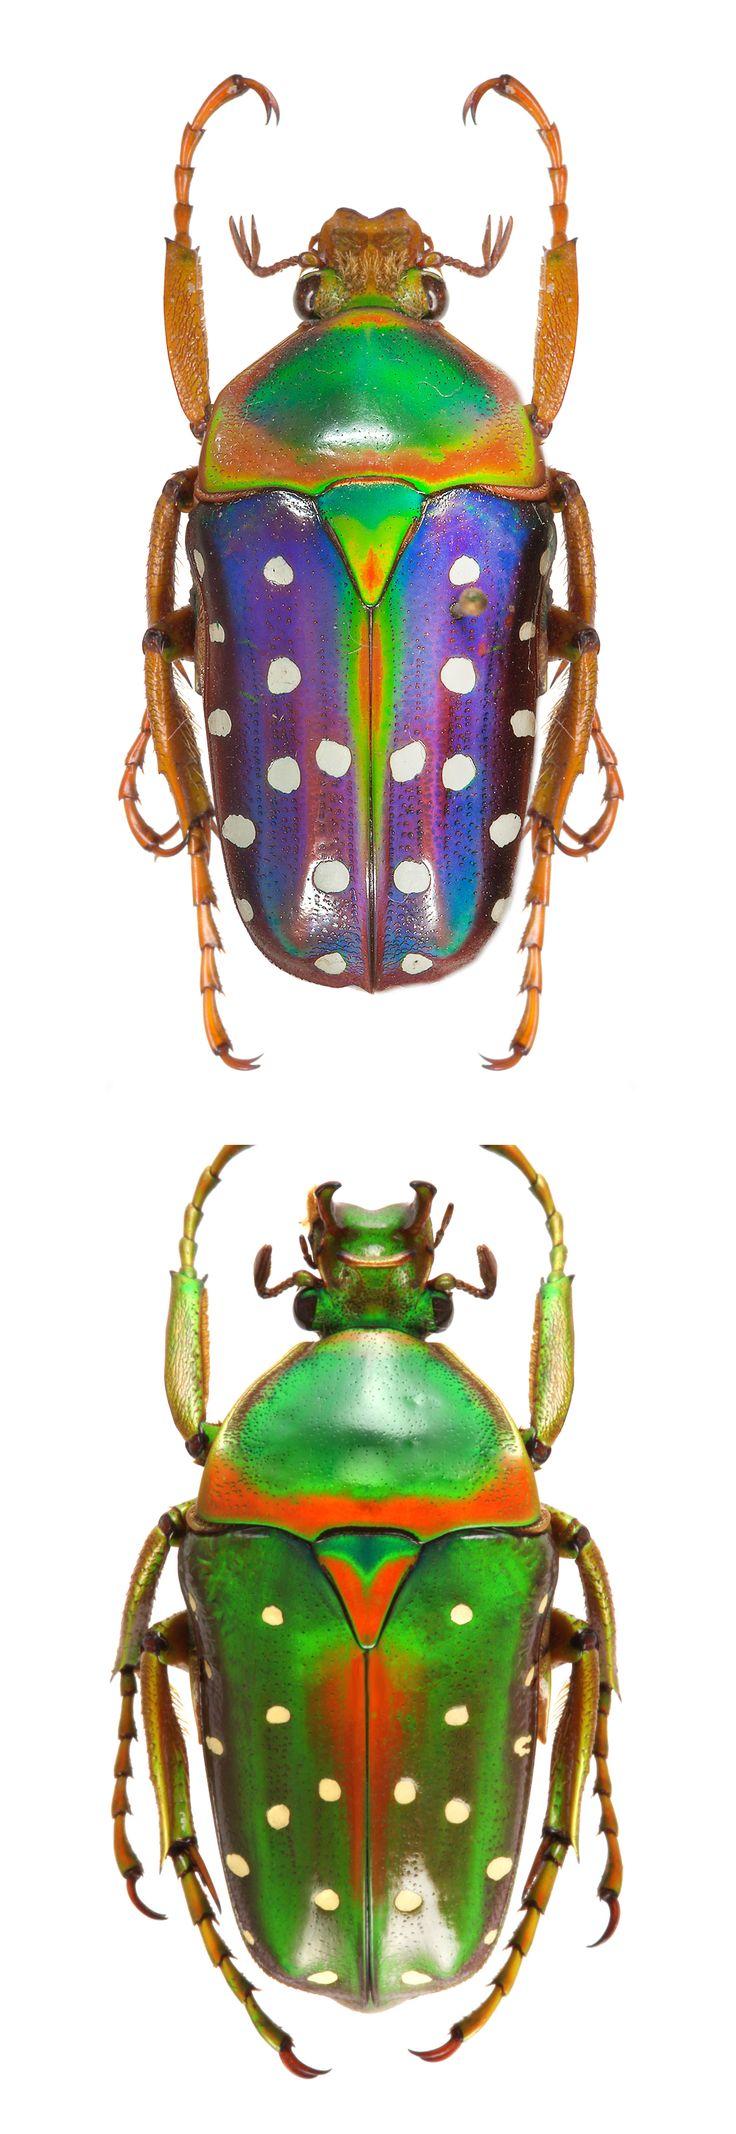 Category:Cetoniidae | Insect Wiki | FANDOM powered by Wikia